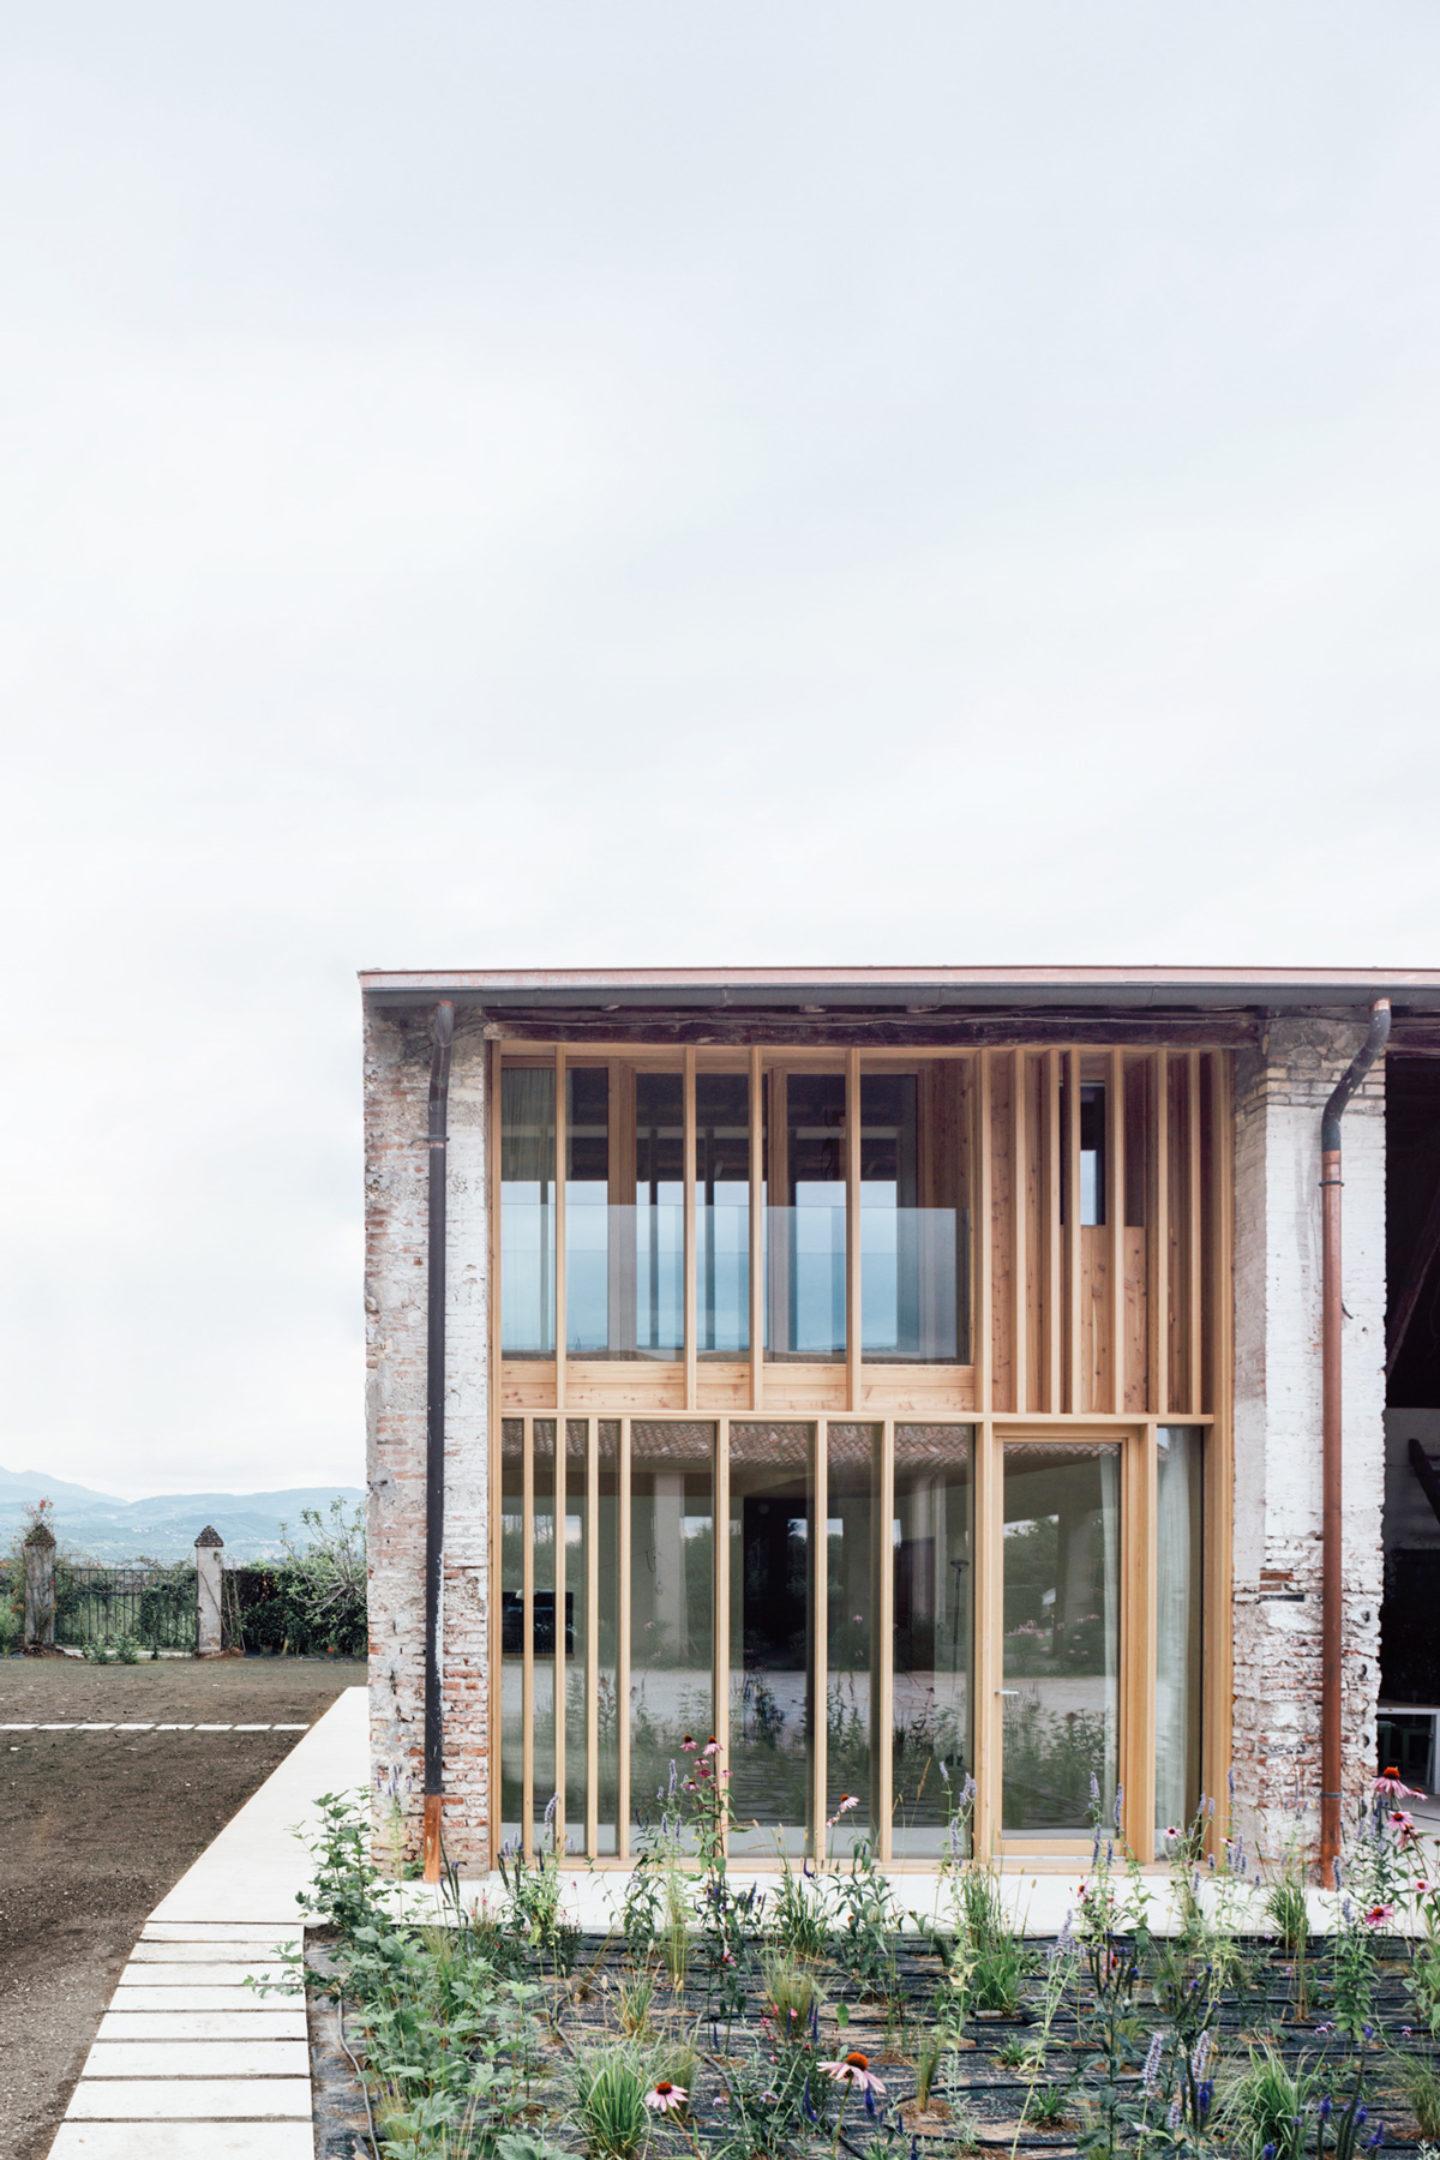 IGNANT-Architecture-Studio-Wok-Country-Home-In-Chievo-13